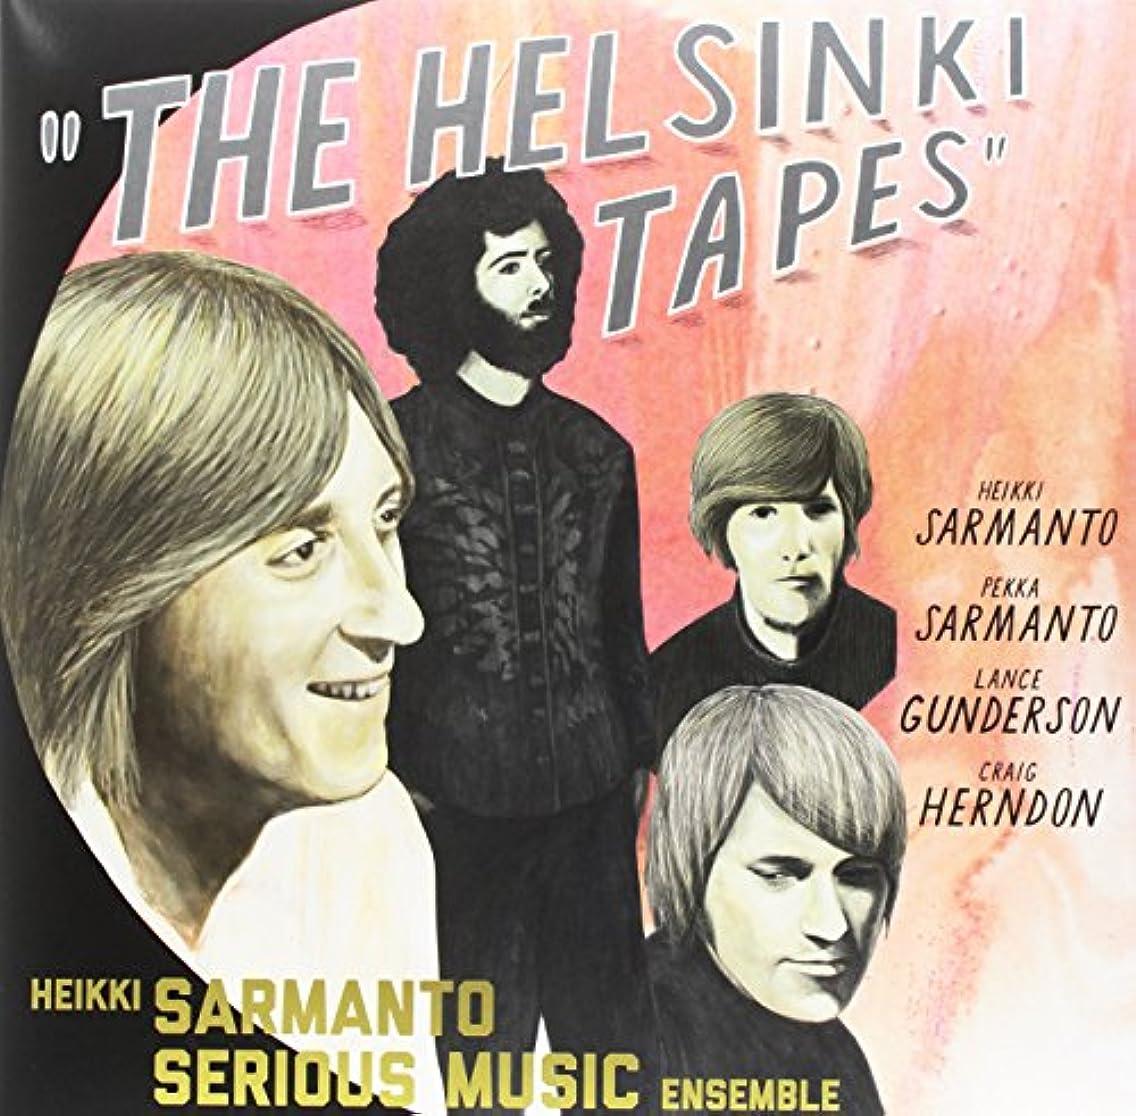 Helsinki Tapes 1